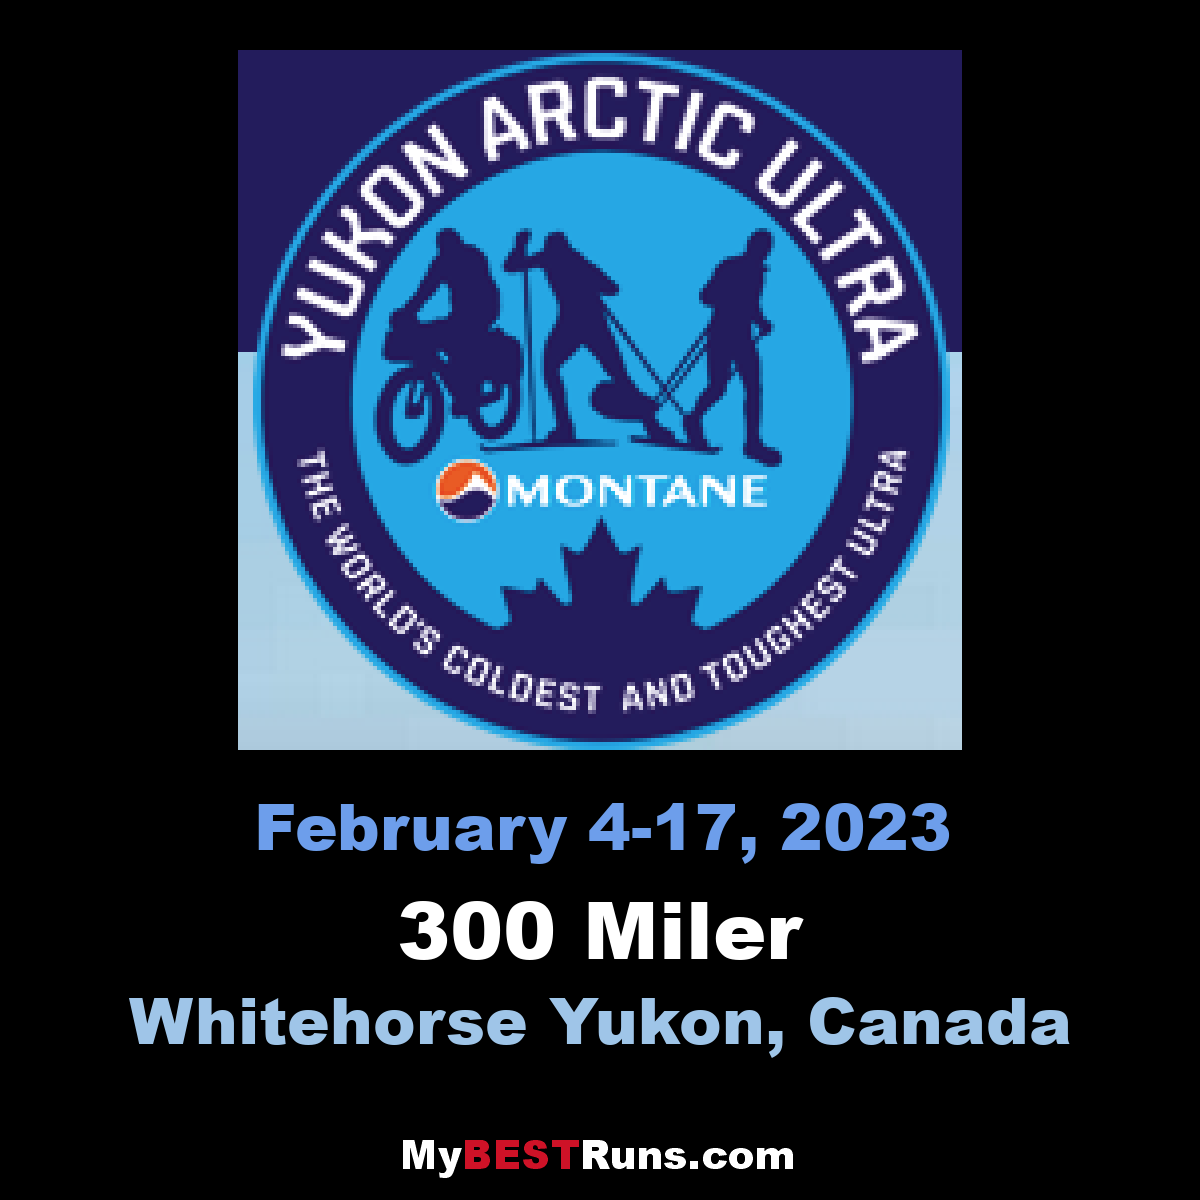 Yukon Artic ultra 300 miler